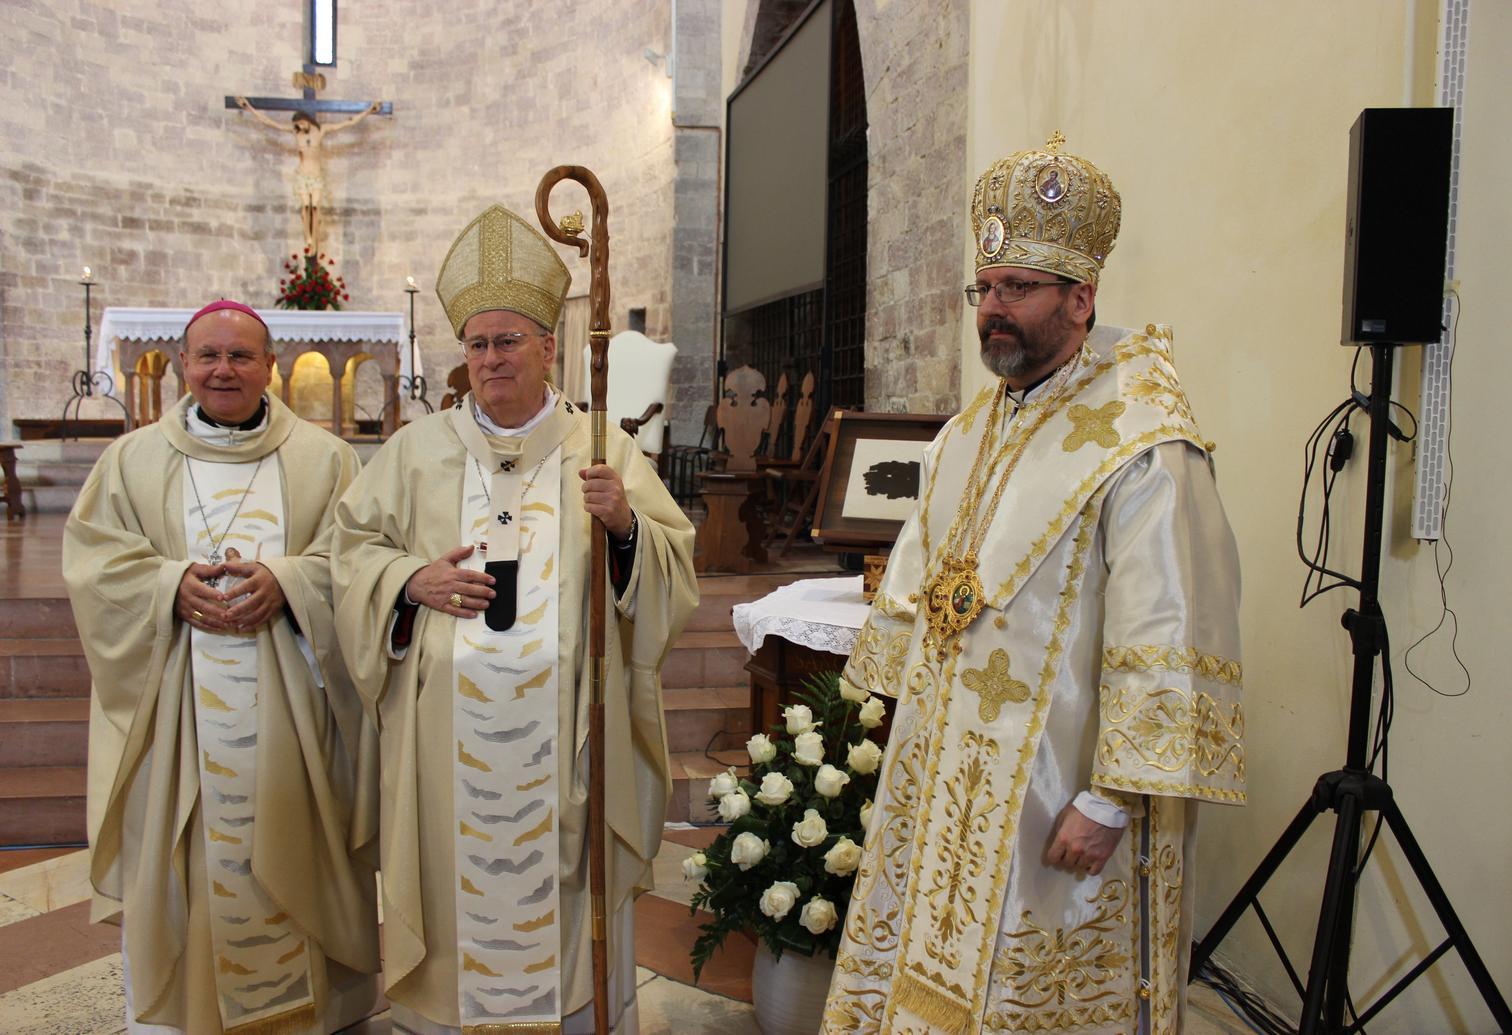 Don fabio rosini incanta i fedeli al santuario della - La tavola rotonda assisi ...